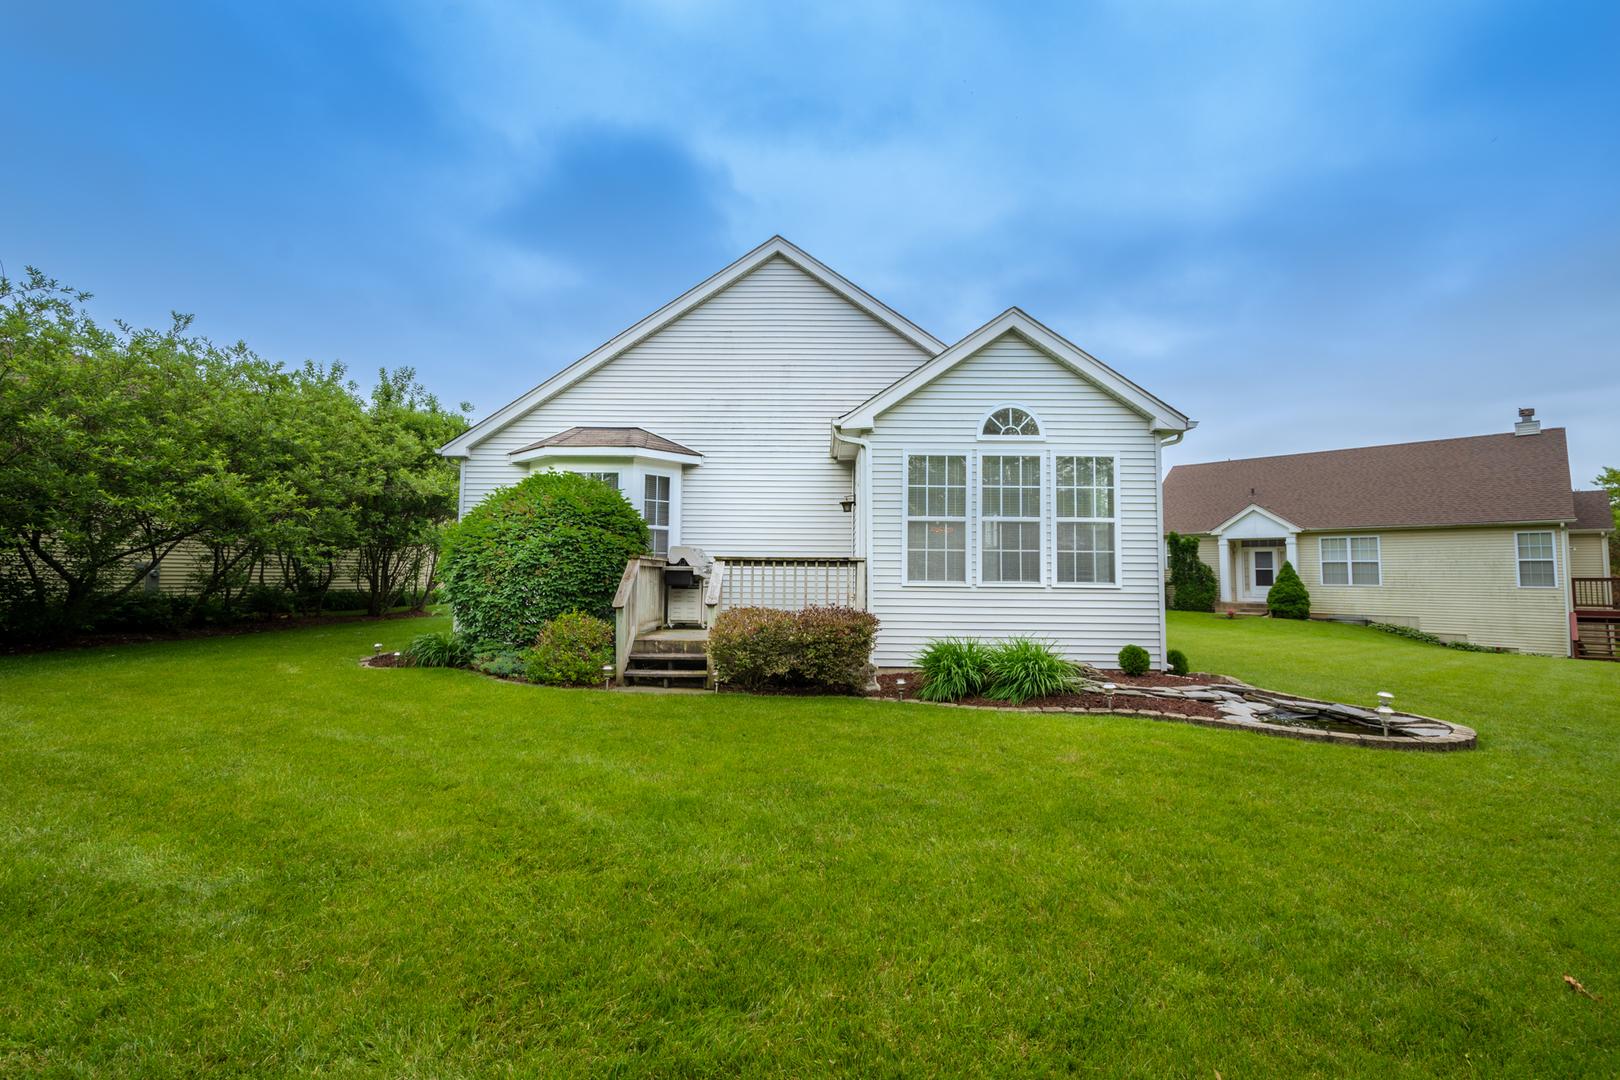 63 West Vandermeer, ANTIOCH, Illinois, 60002